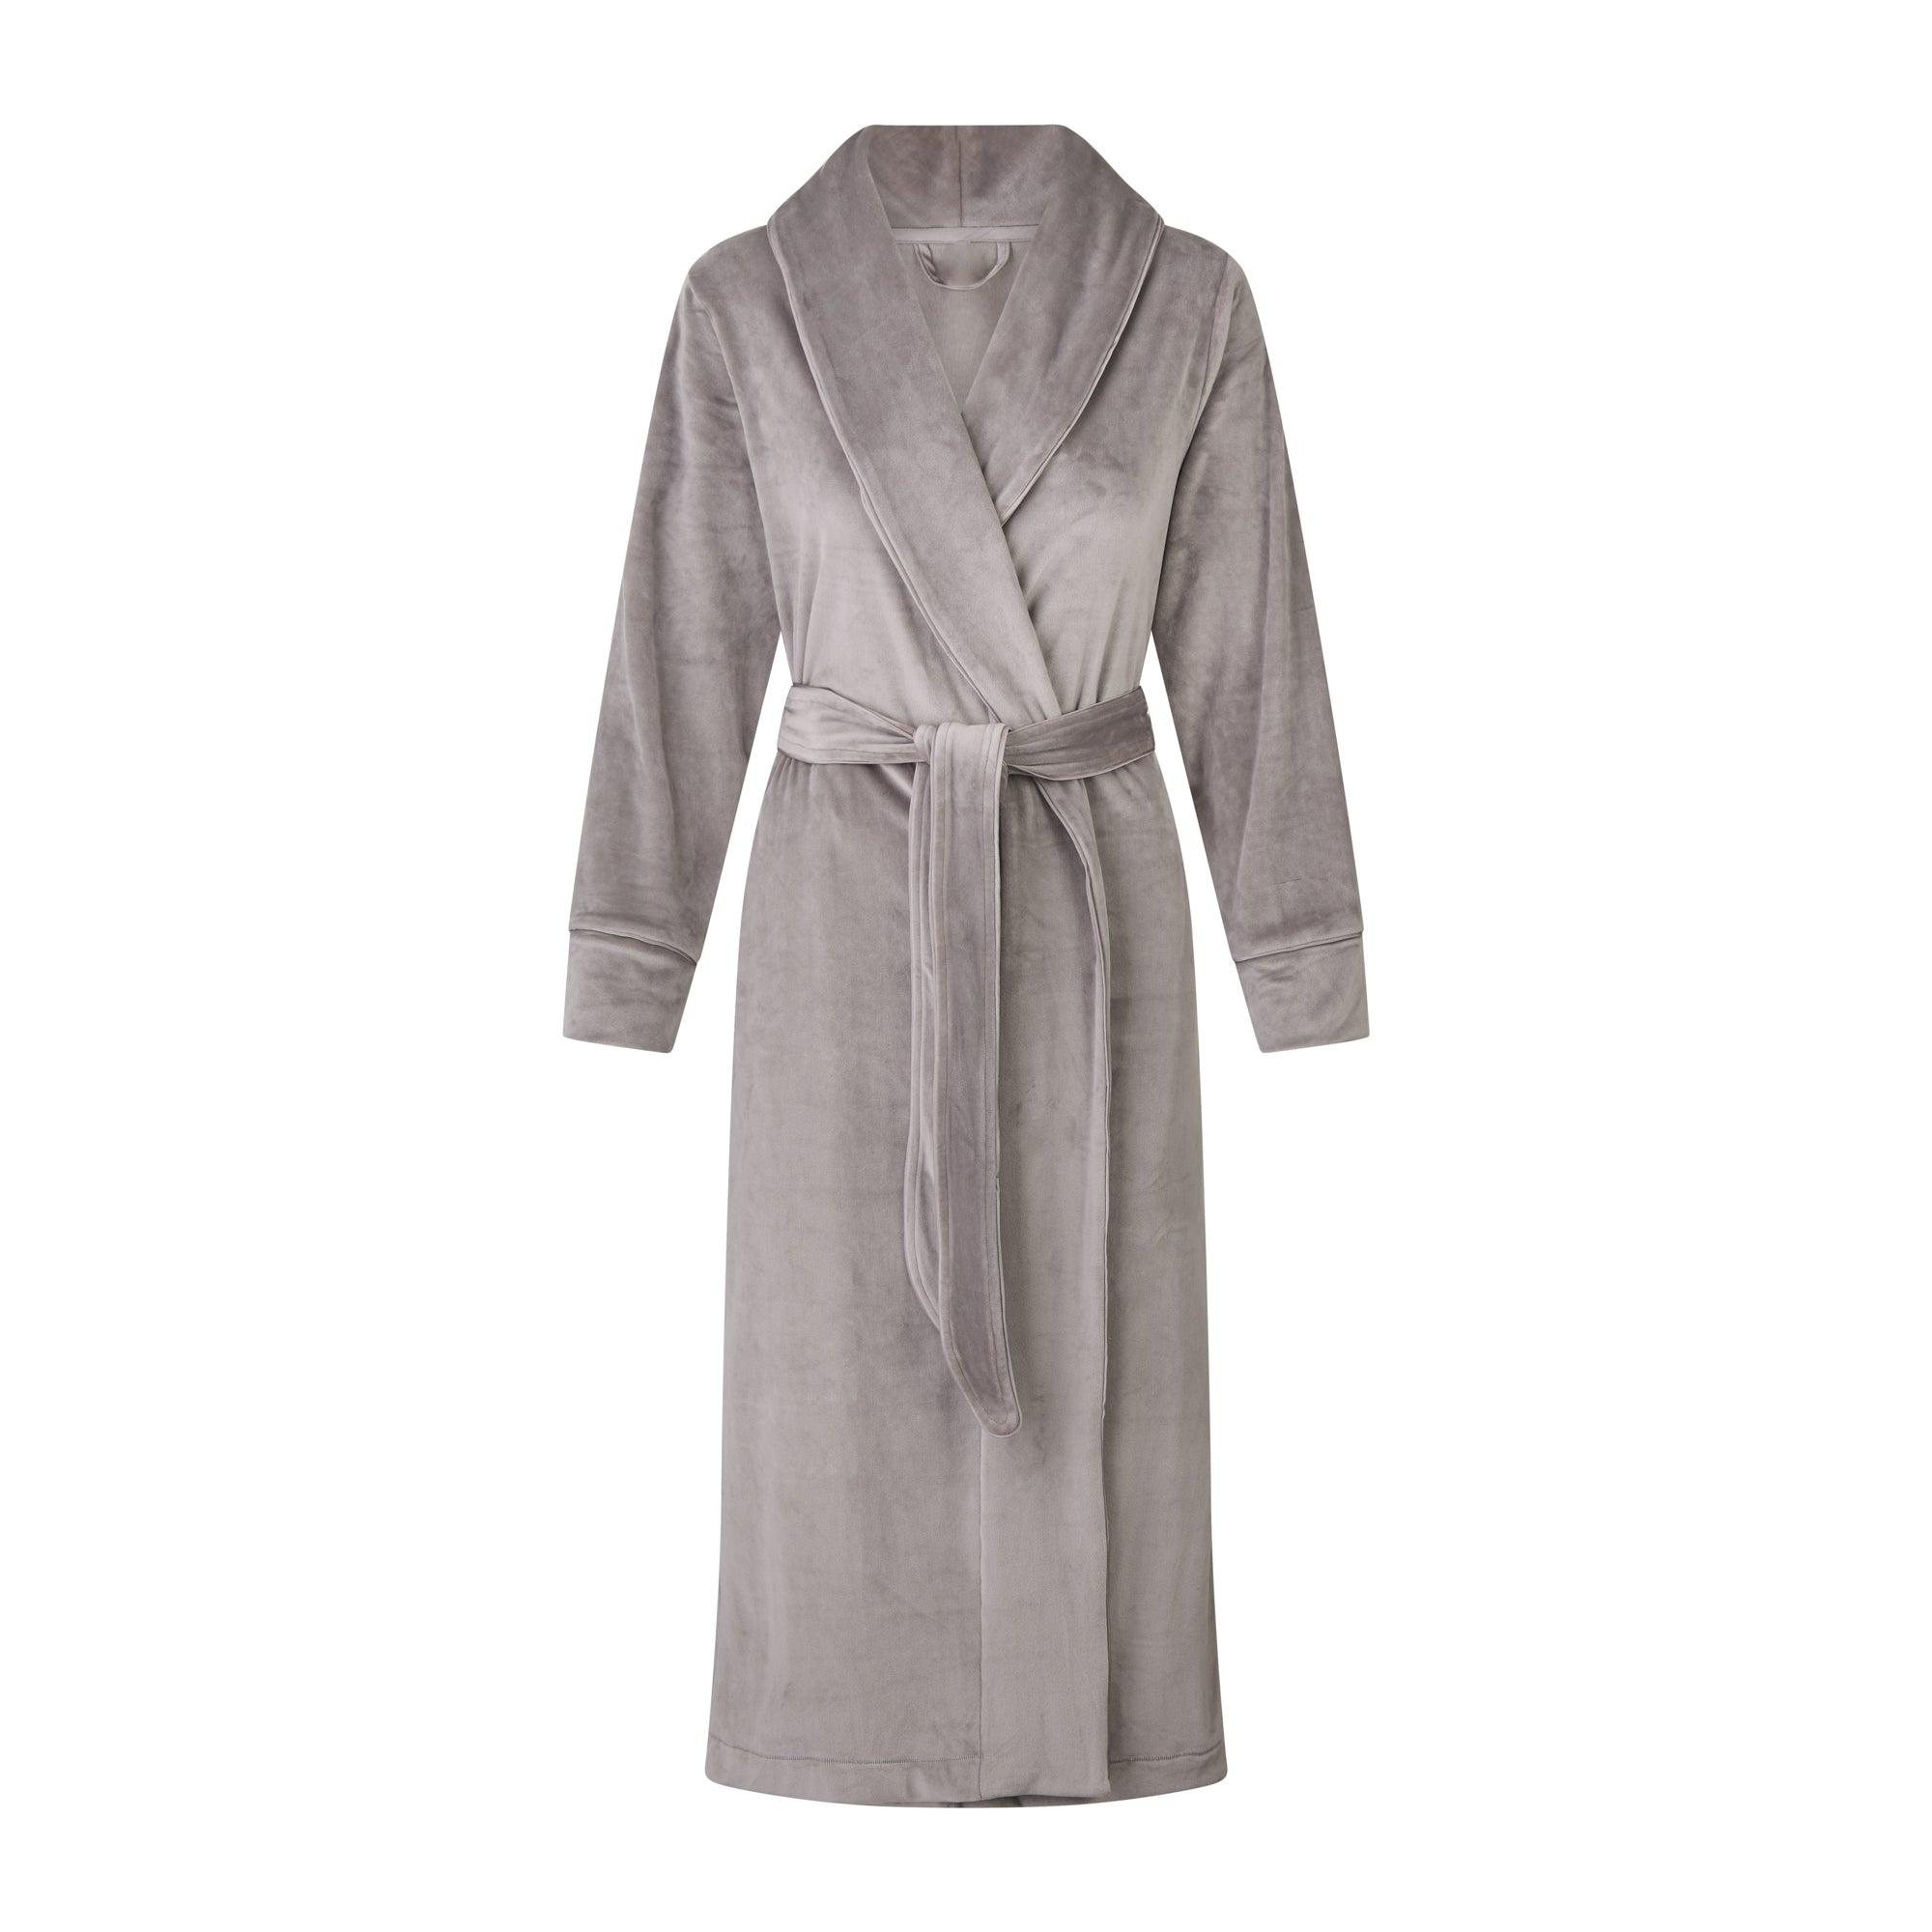 SKIMS Women's Velour Long Robe - Gray - Size 3XL; Gray